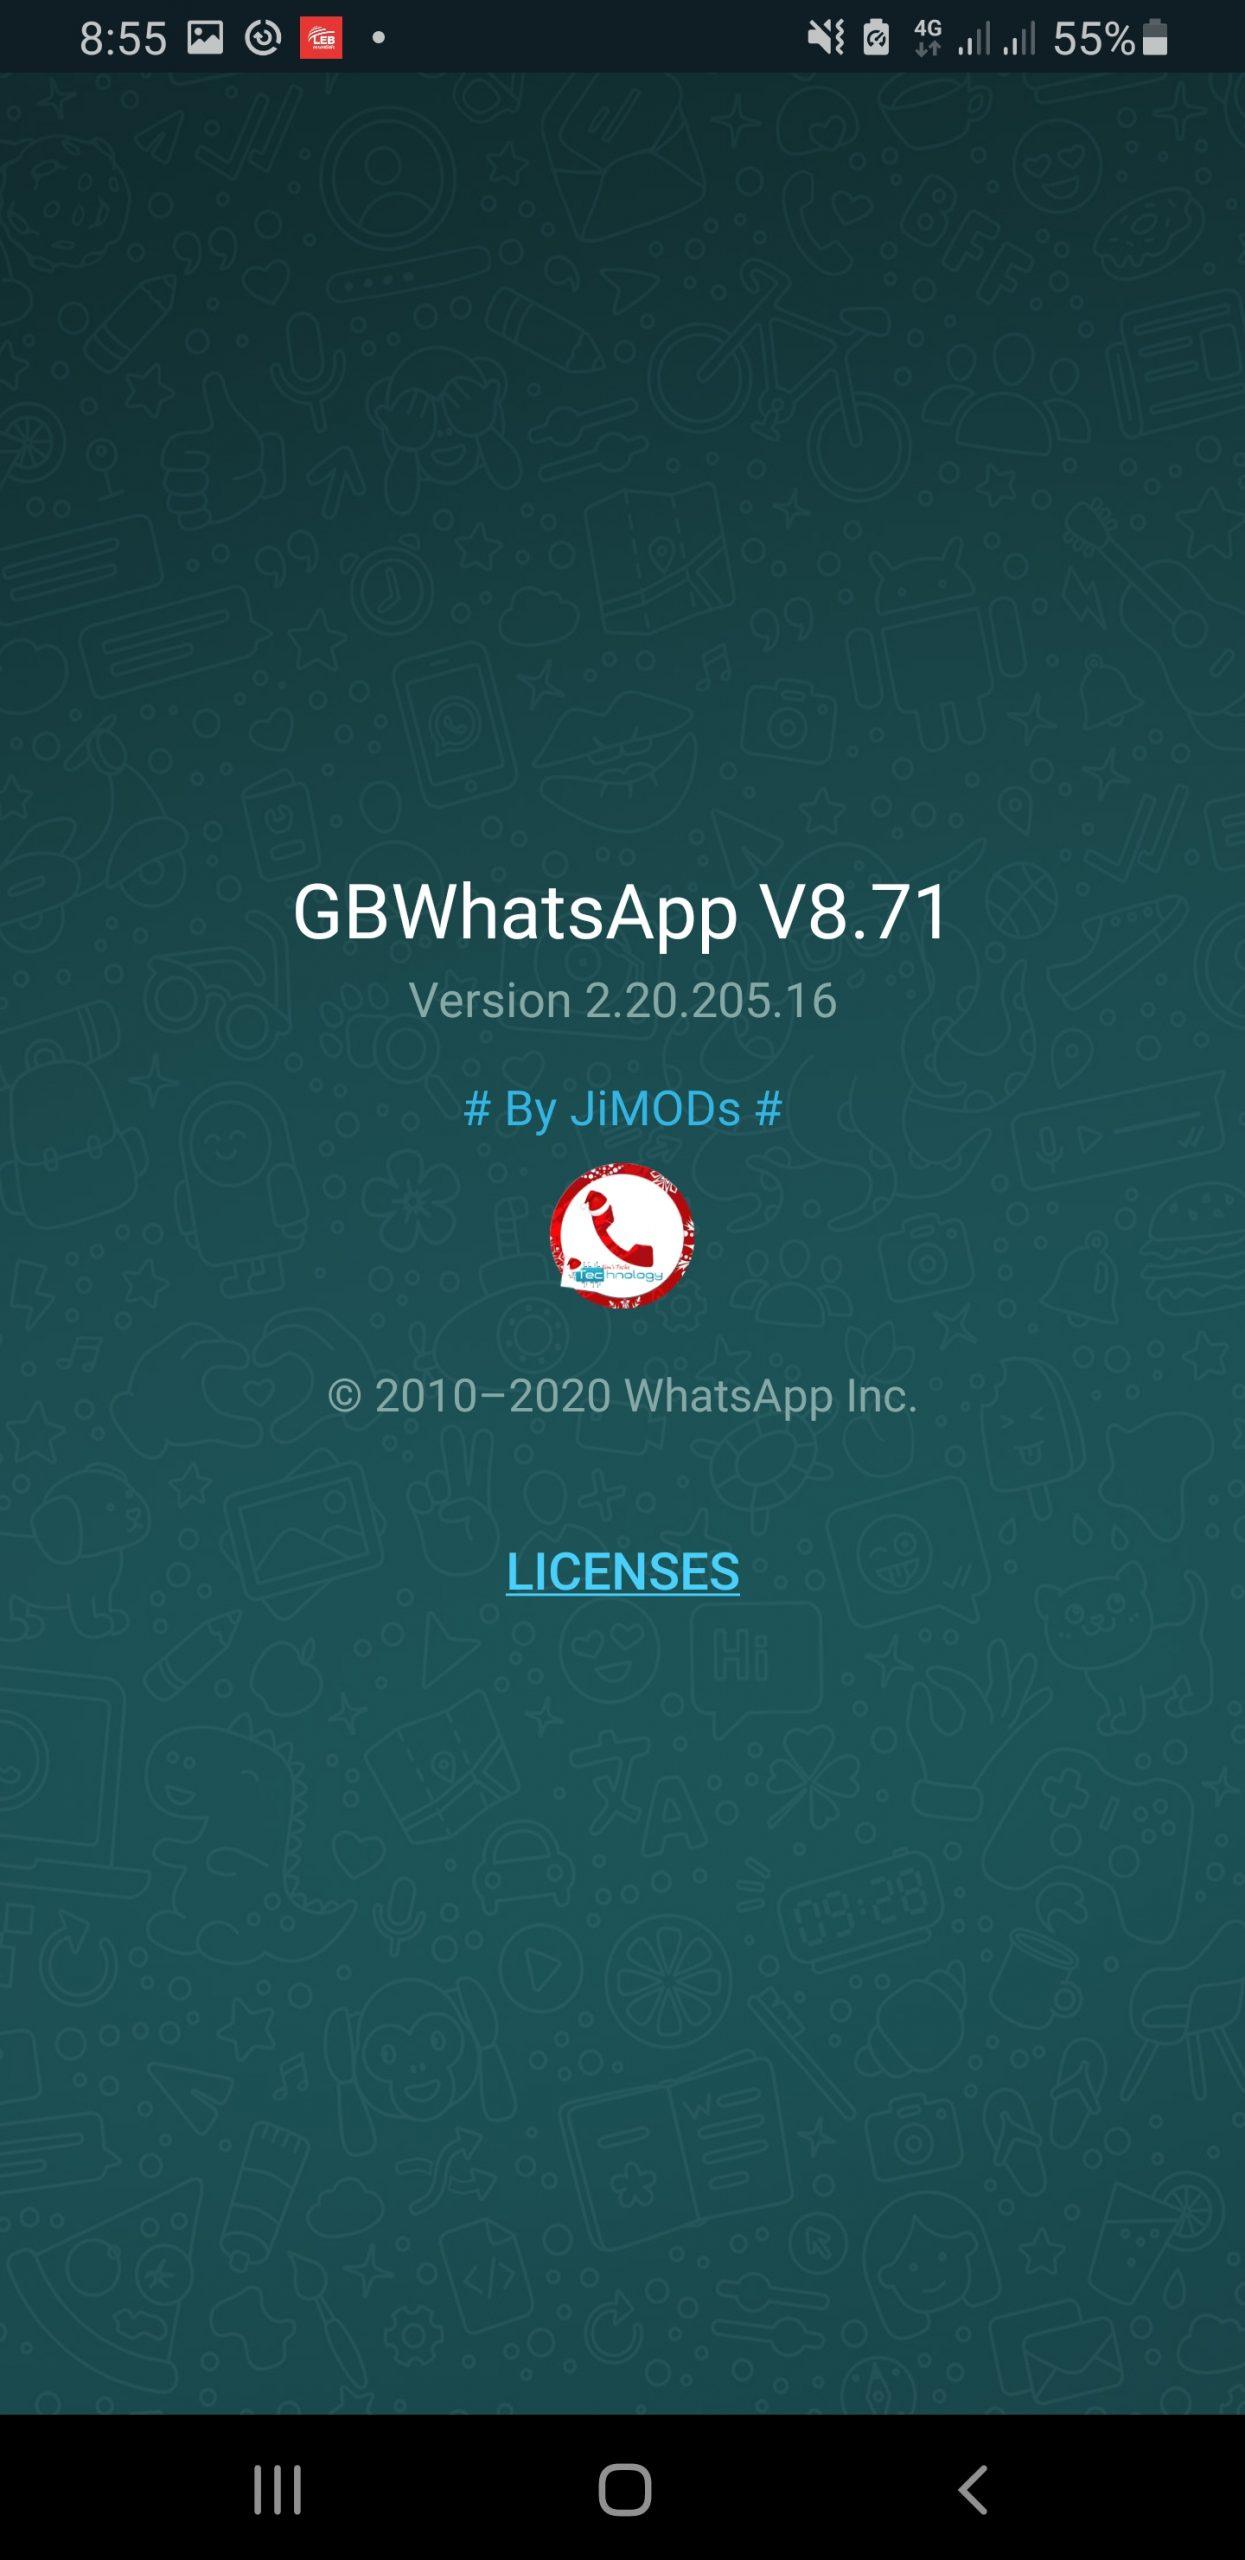 https://jimtechs.biz/wp-content/uploads/2021/01/WhatsApp-JiMODs-v8.71-Jimtechs-Editions.html